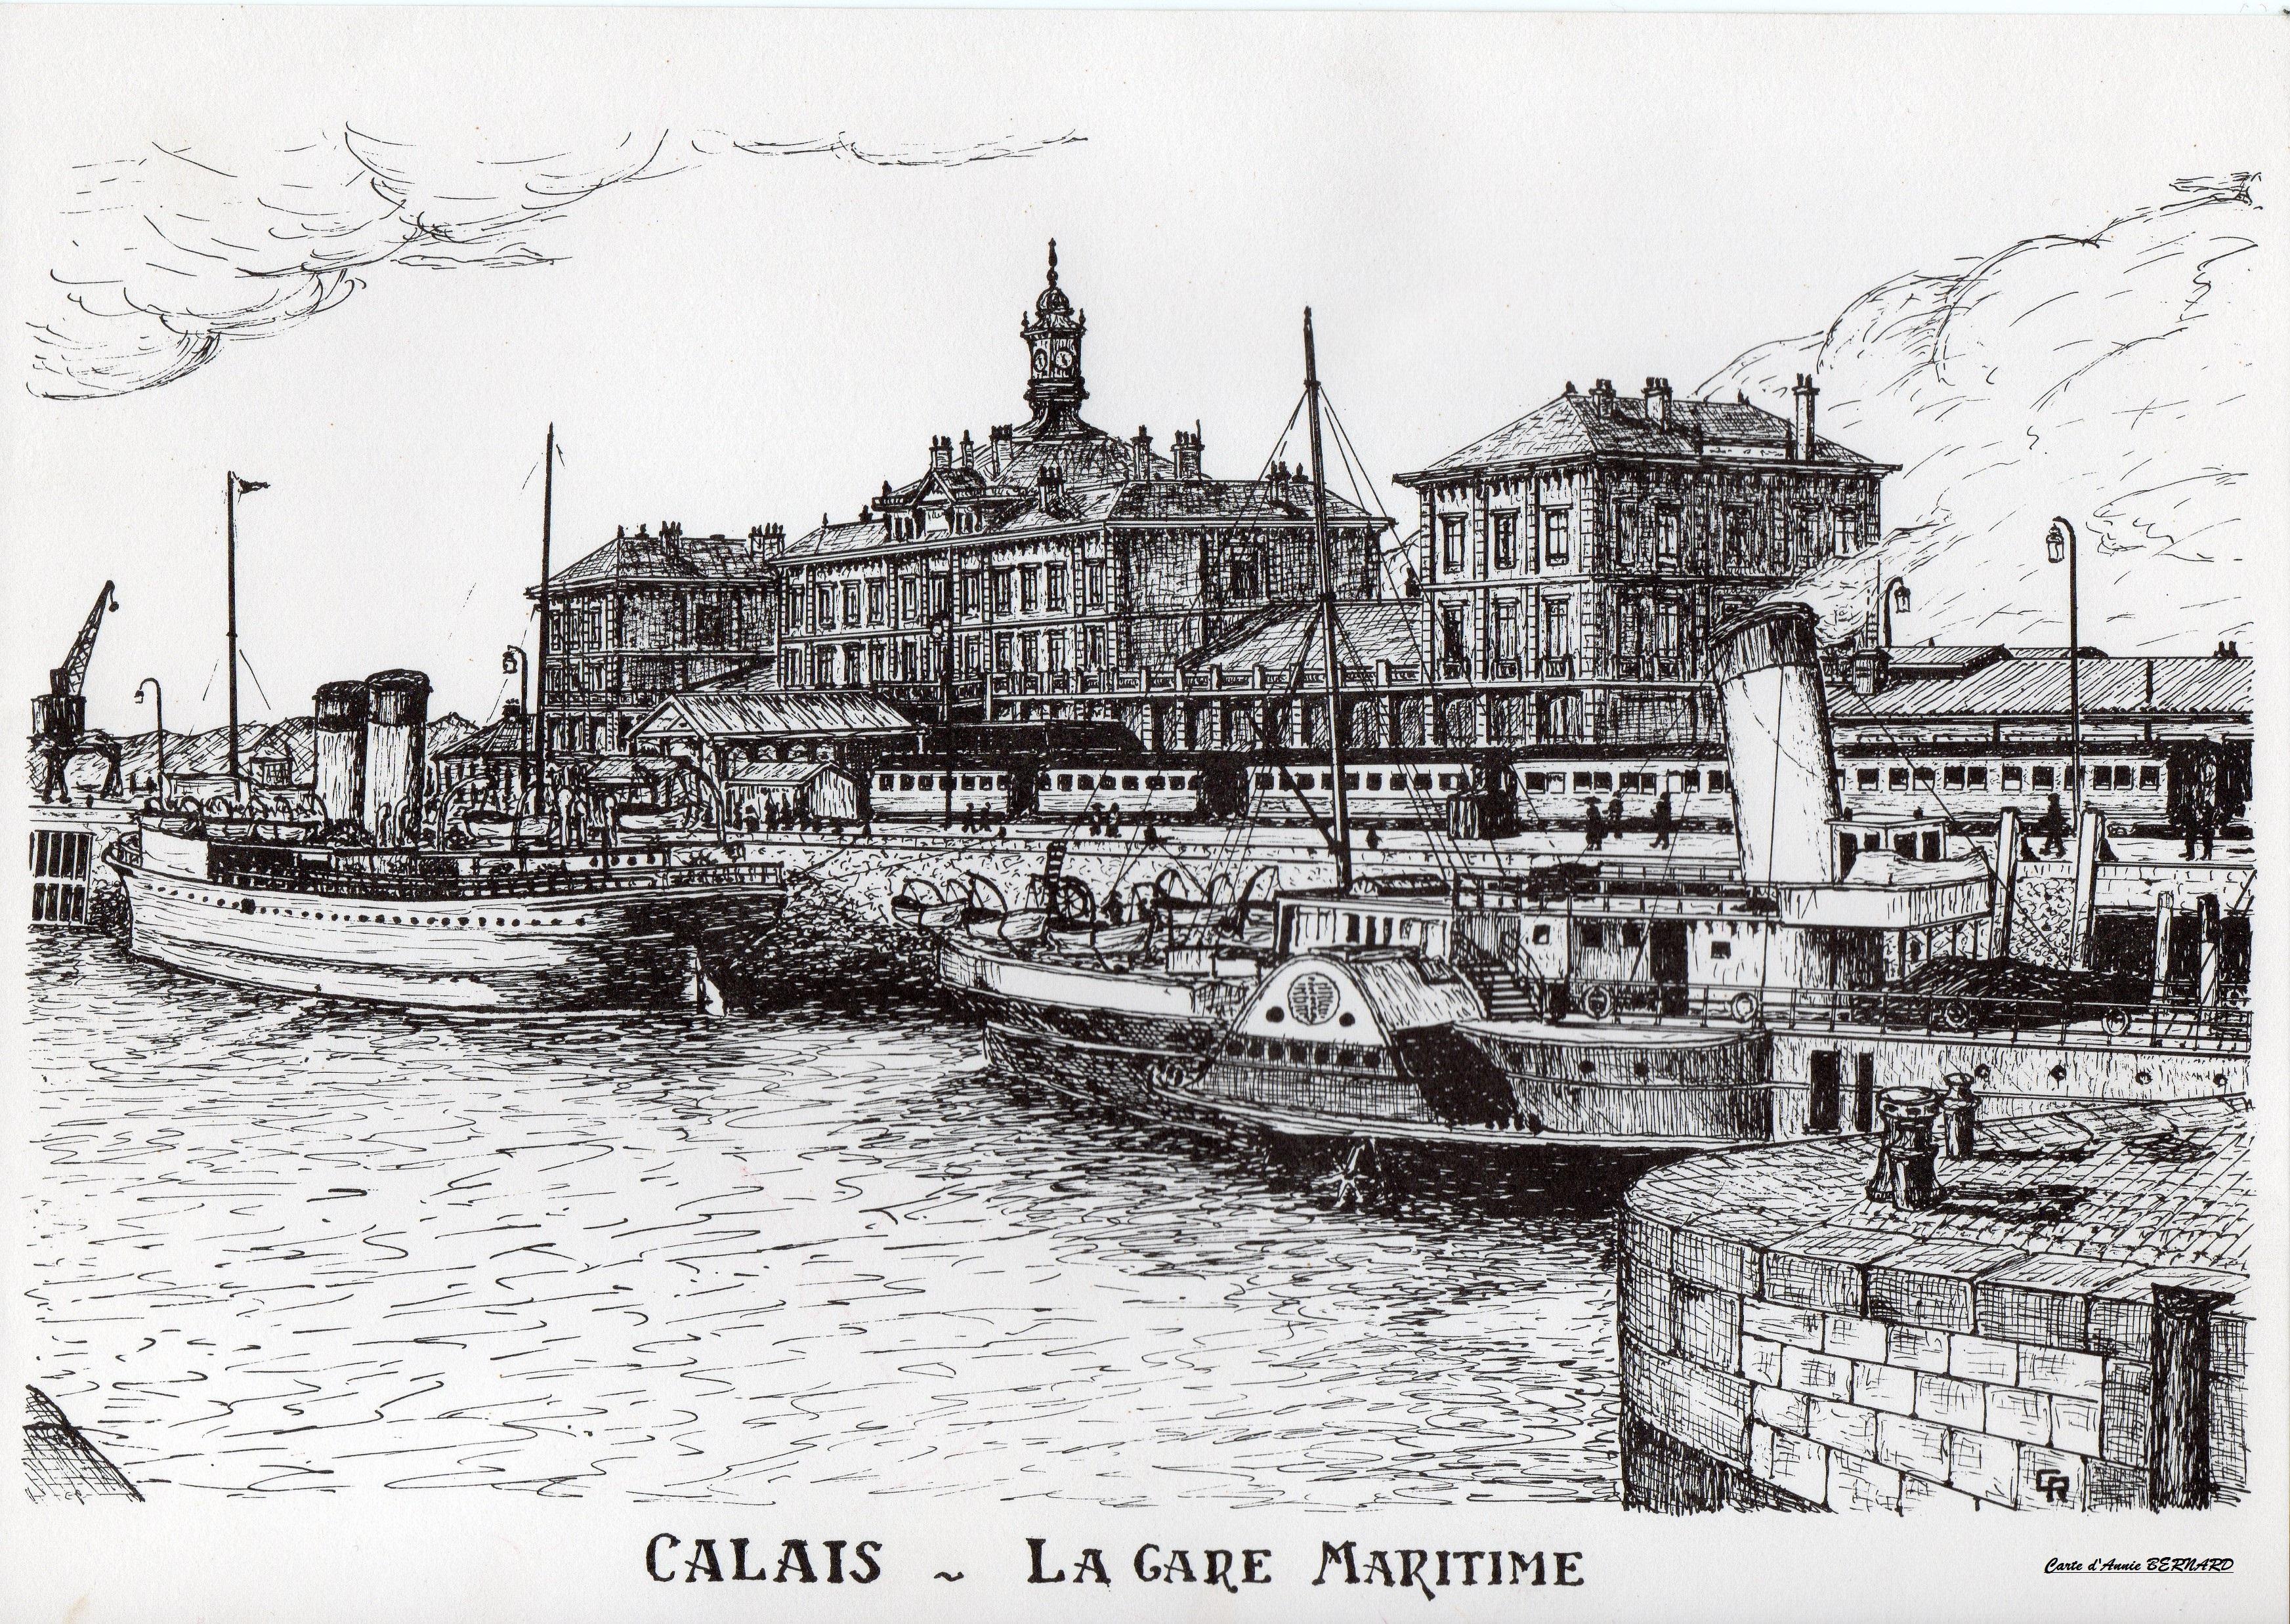 Calais rétro, la gare maritime